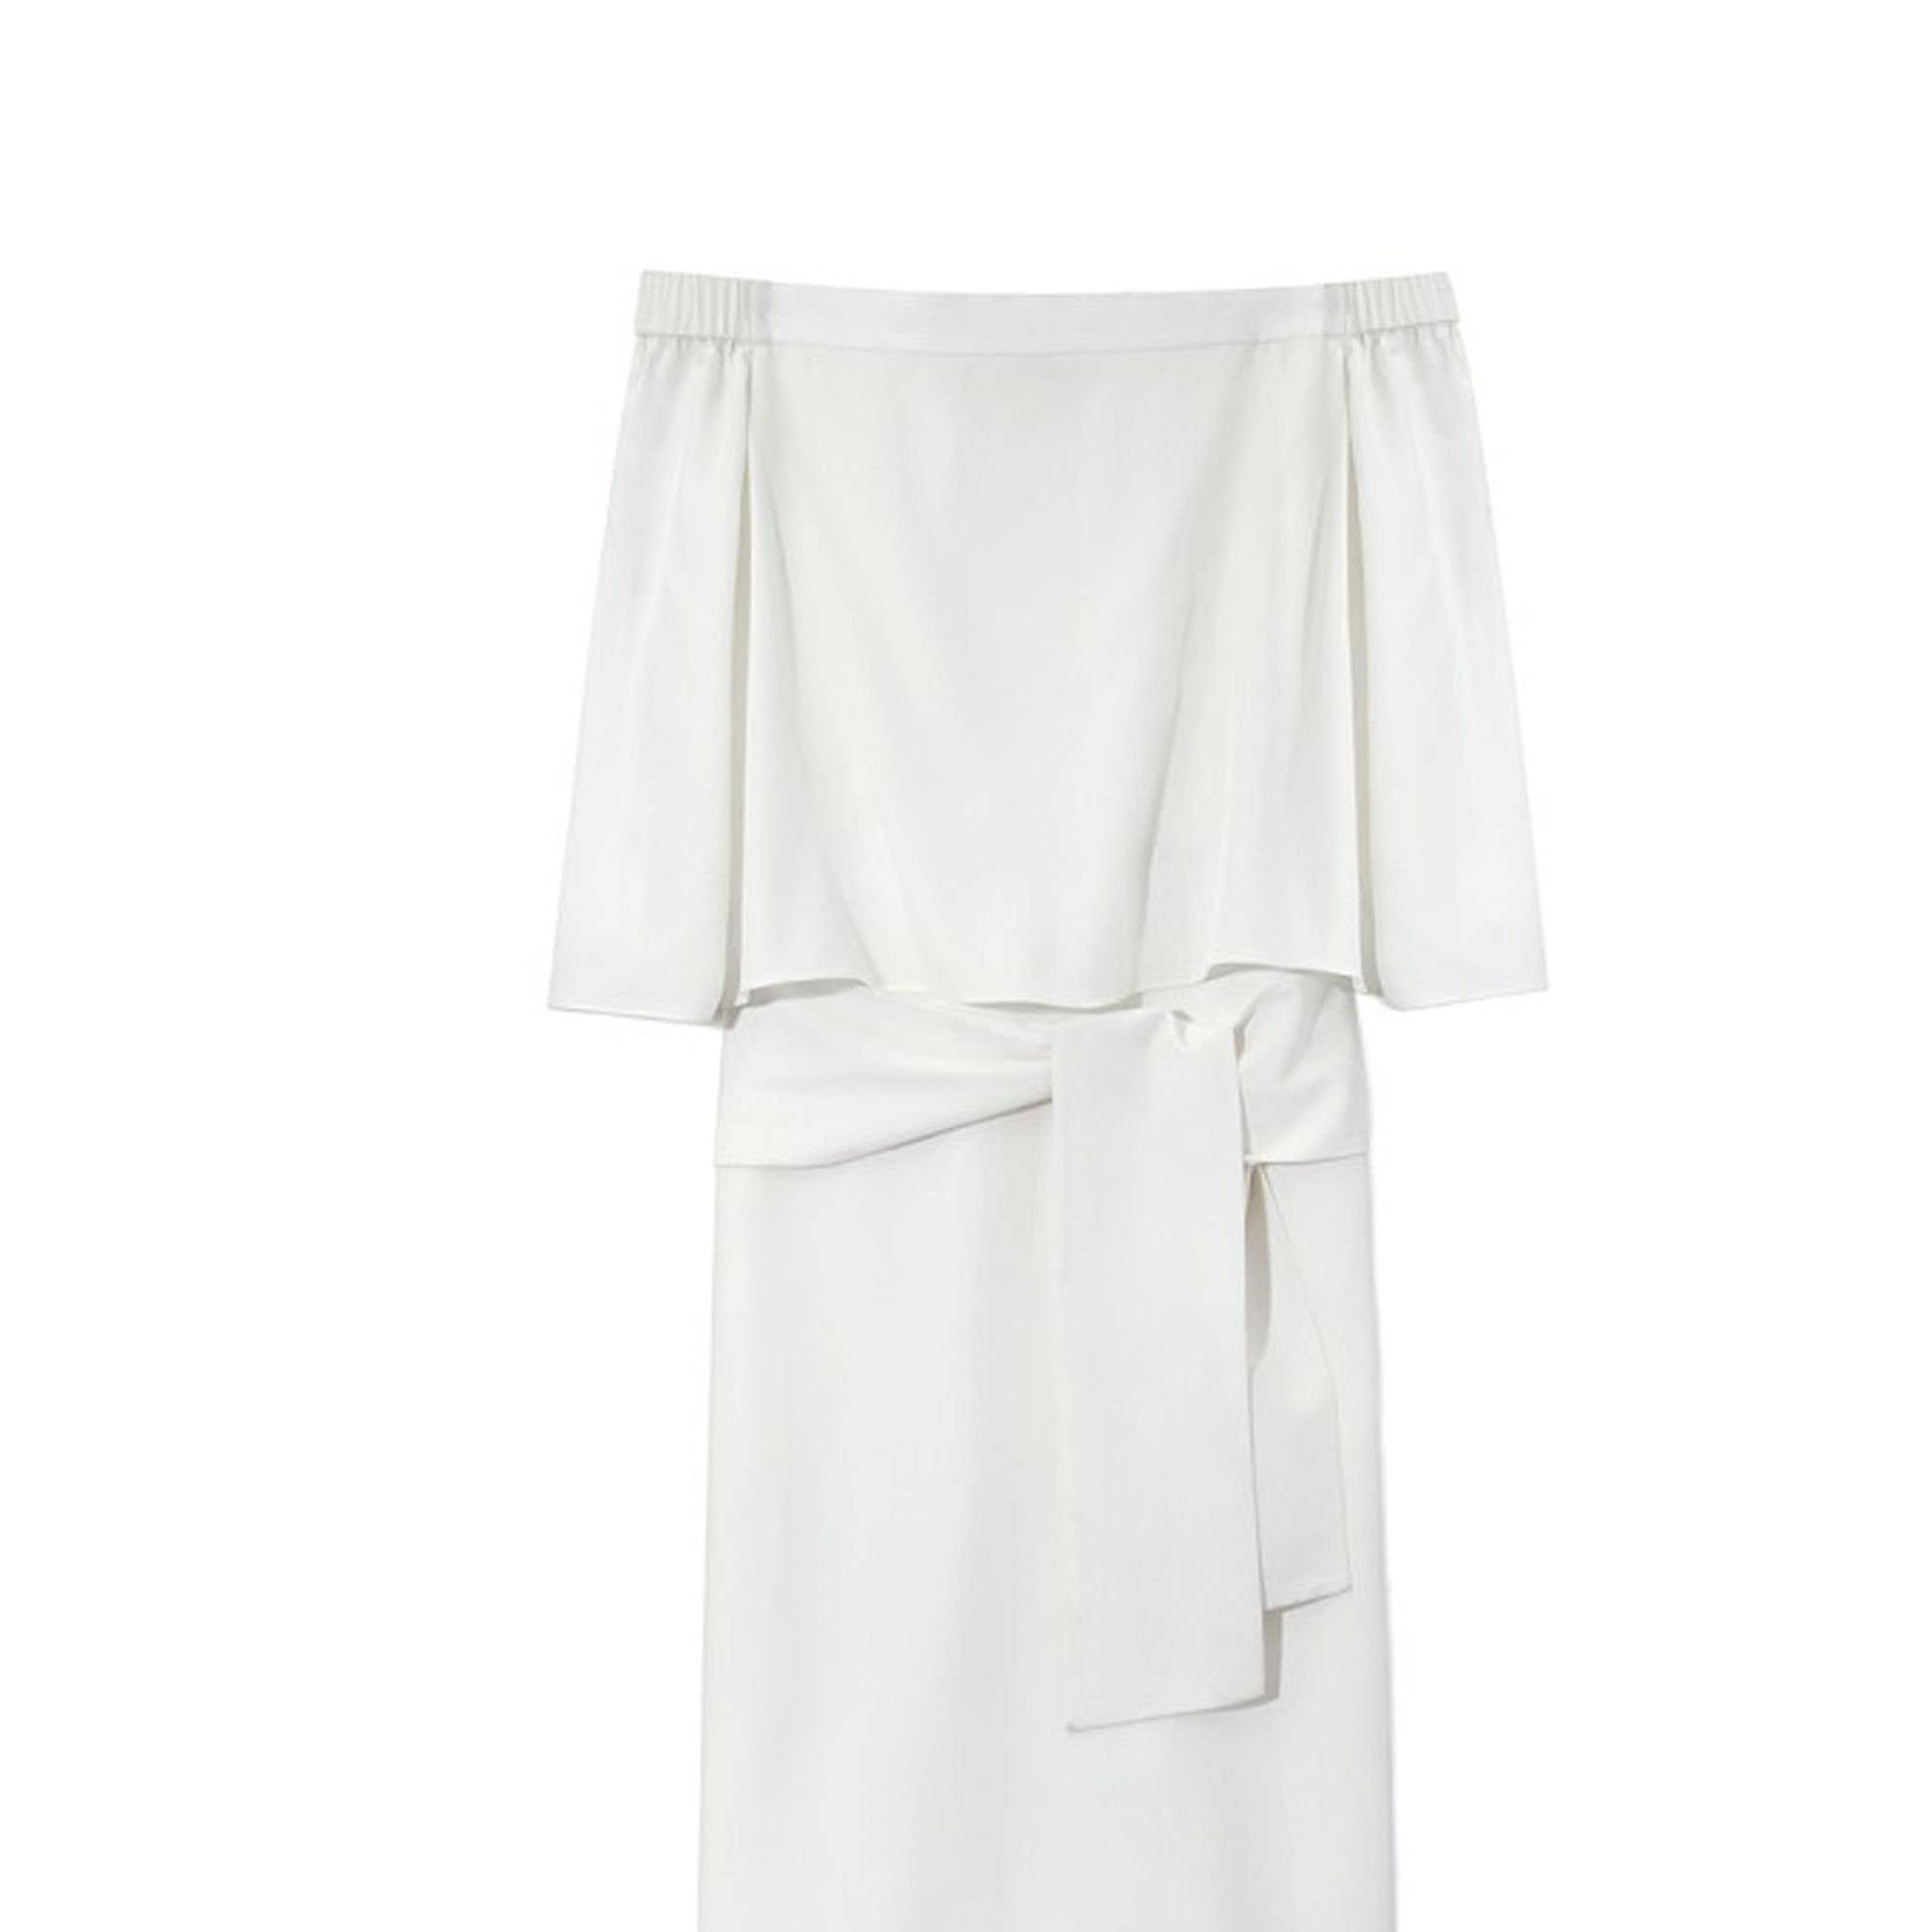 "<em>Tibi dress, $595, <a href=""http://shop.harpersbazaar.com/designers/tibi/white-off-the-shoulder-dress/"" target=""_blank"">shopBAZAAR.com</a>.</em>"